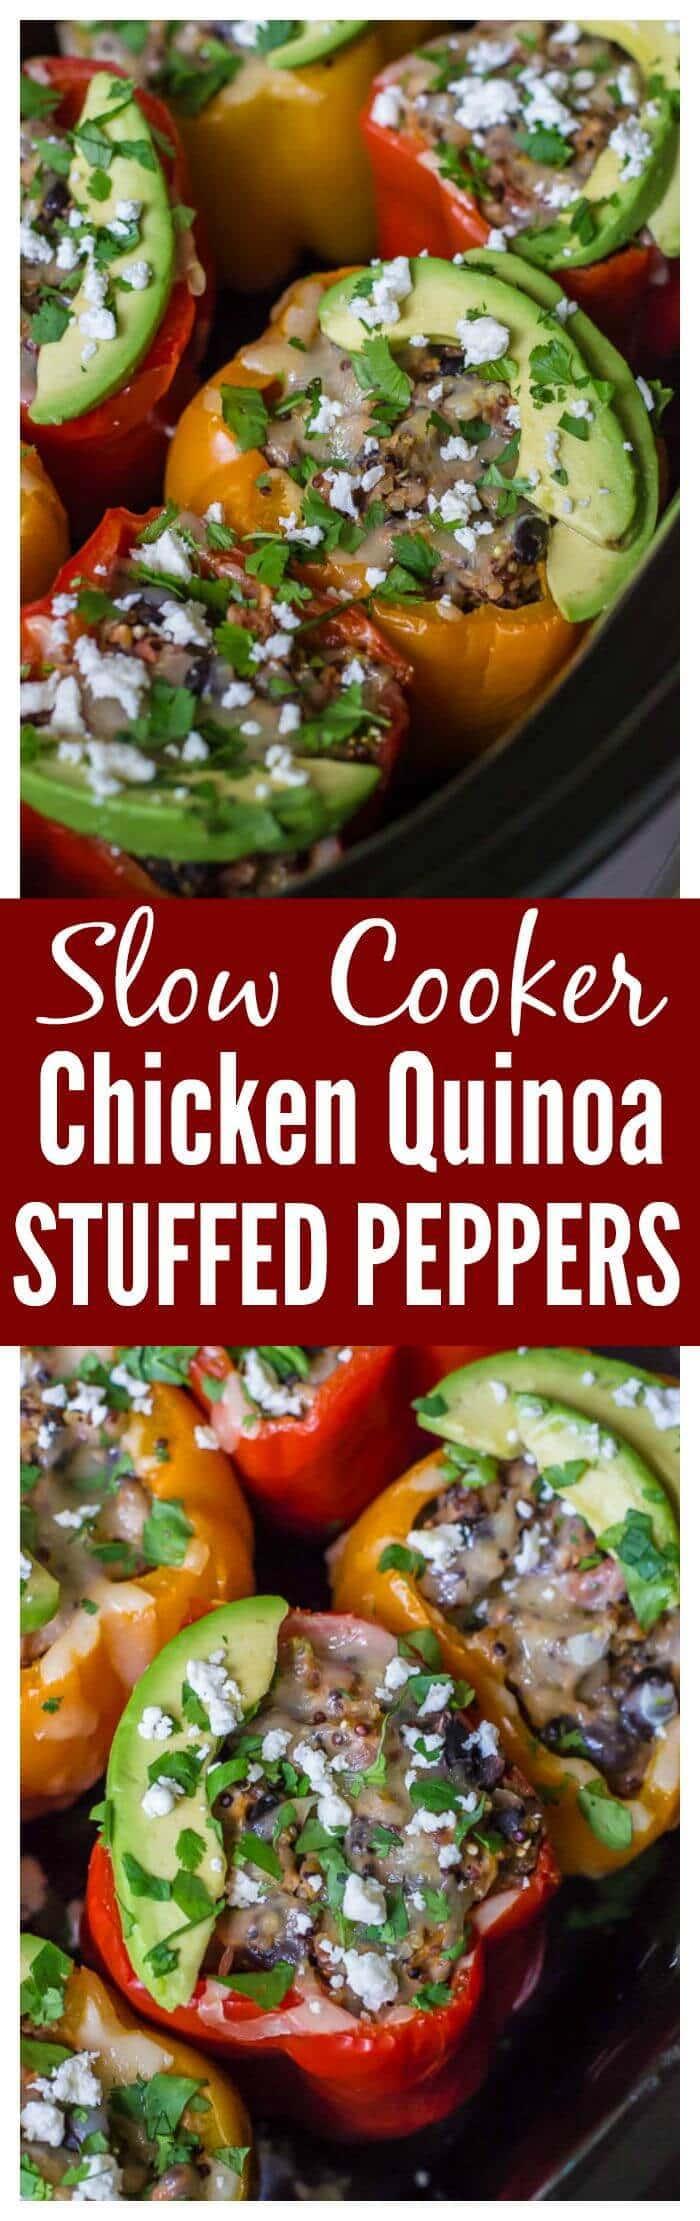 BEST EVER Mexican Crock Pot Stuffed Peppers with Quinoa, Black Beans, and Ground Turkey or chicken. #healthyrecipe #freezermeals #glutenfree #slowcooker #crockpot